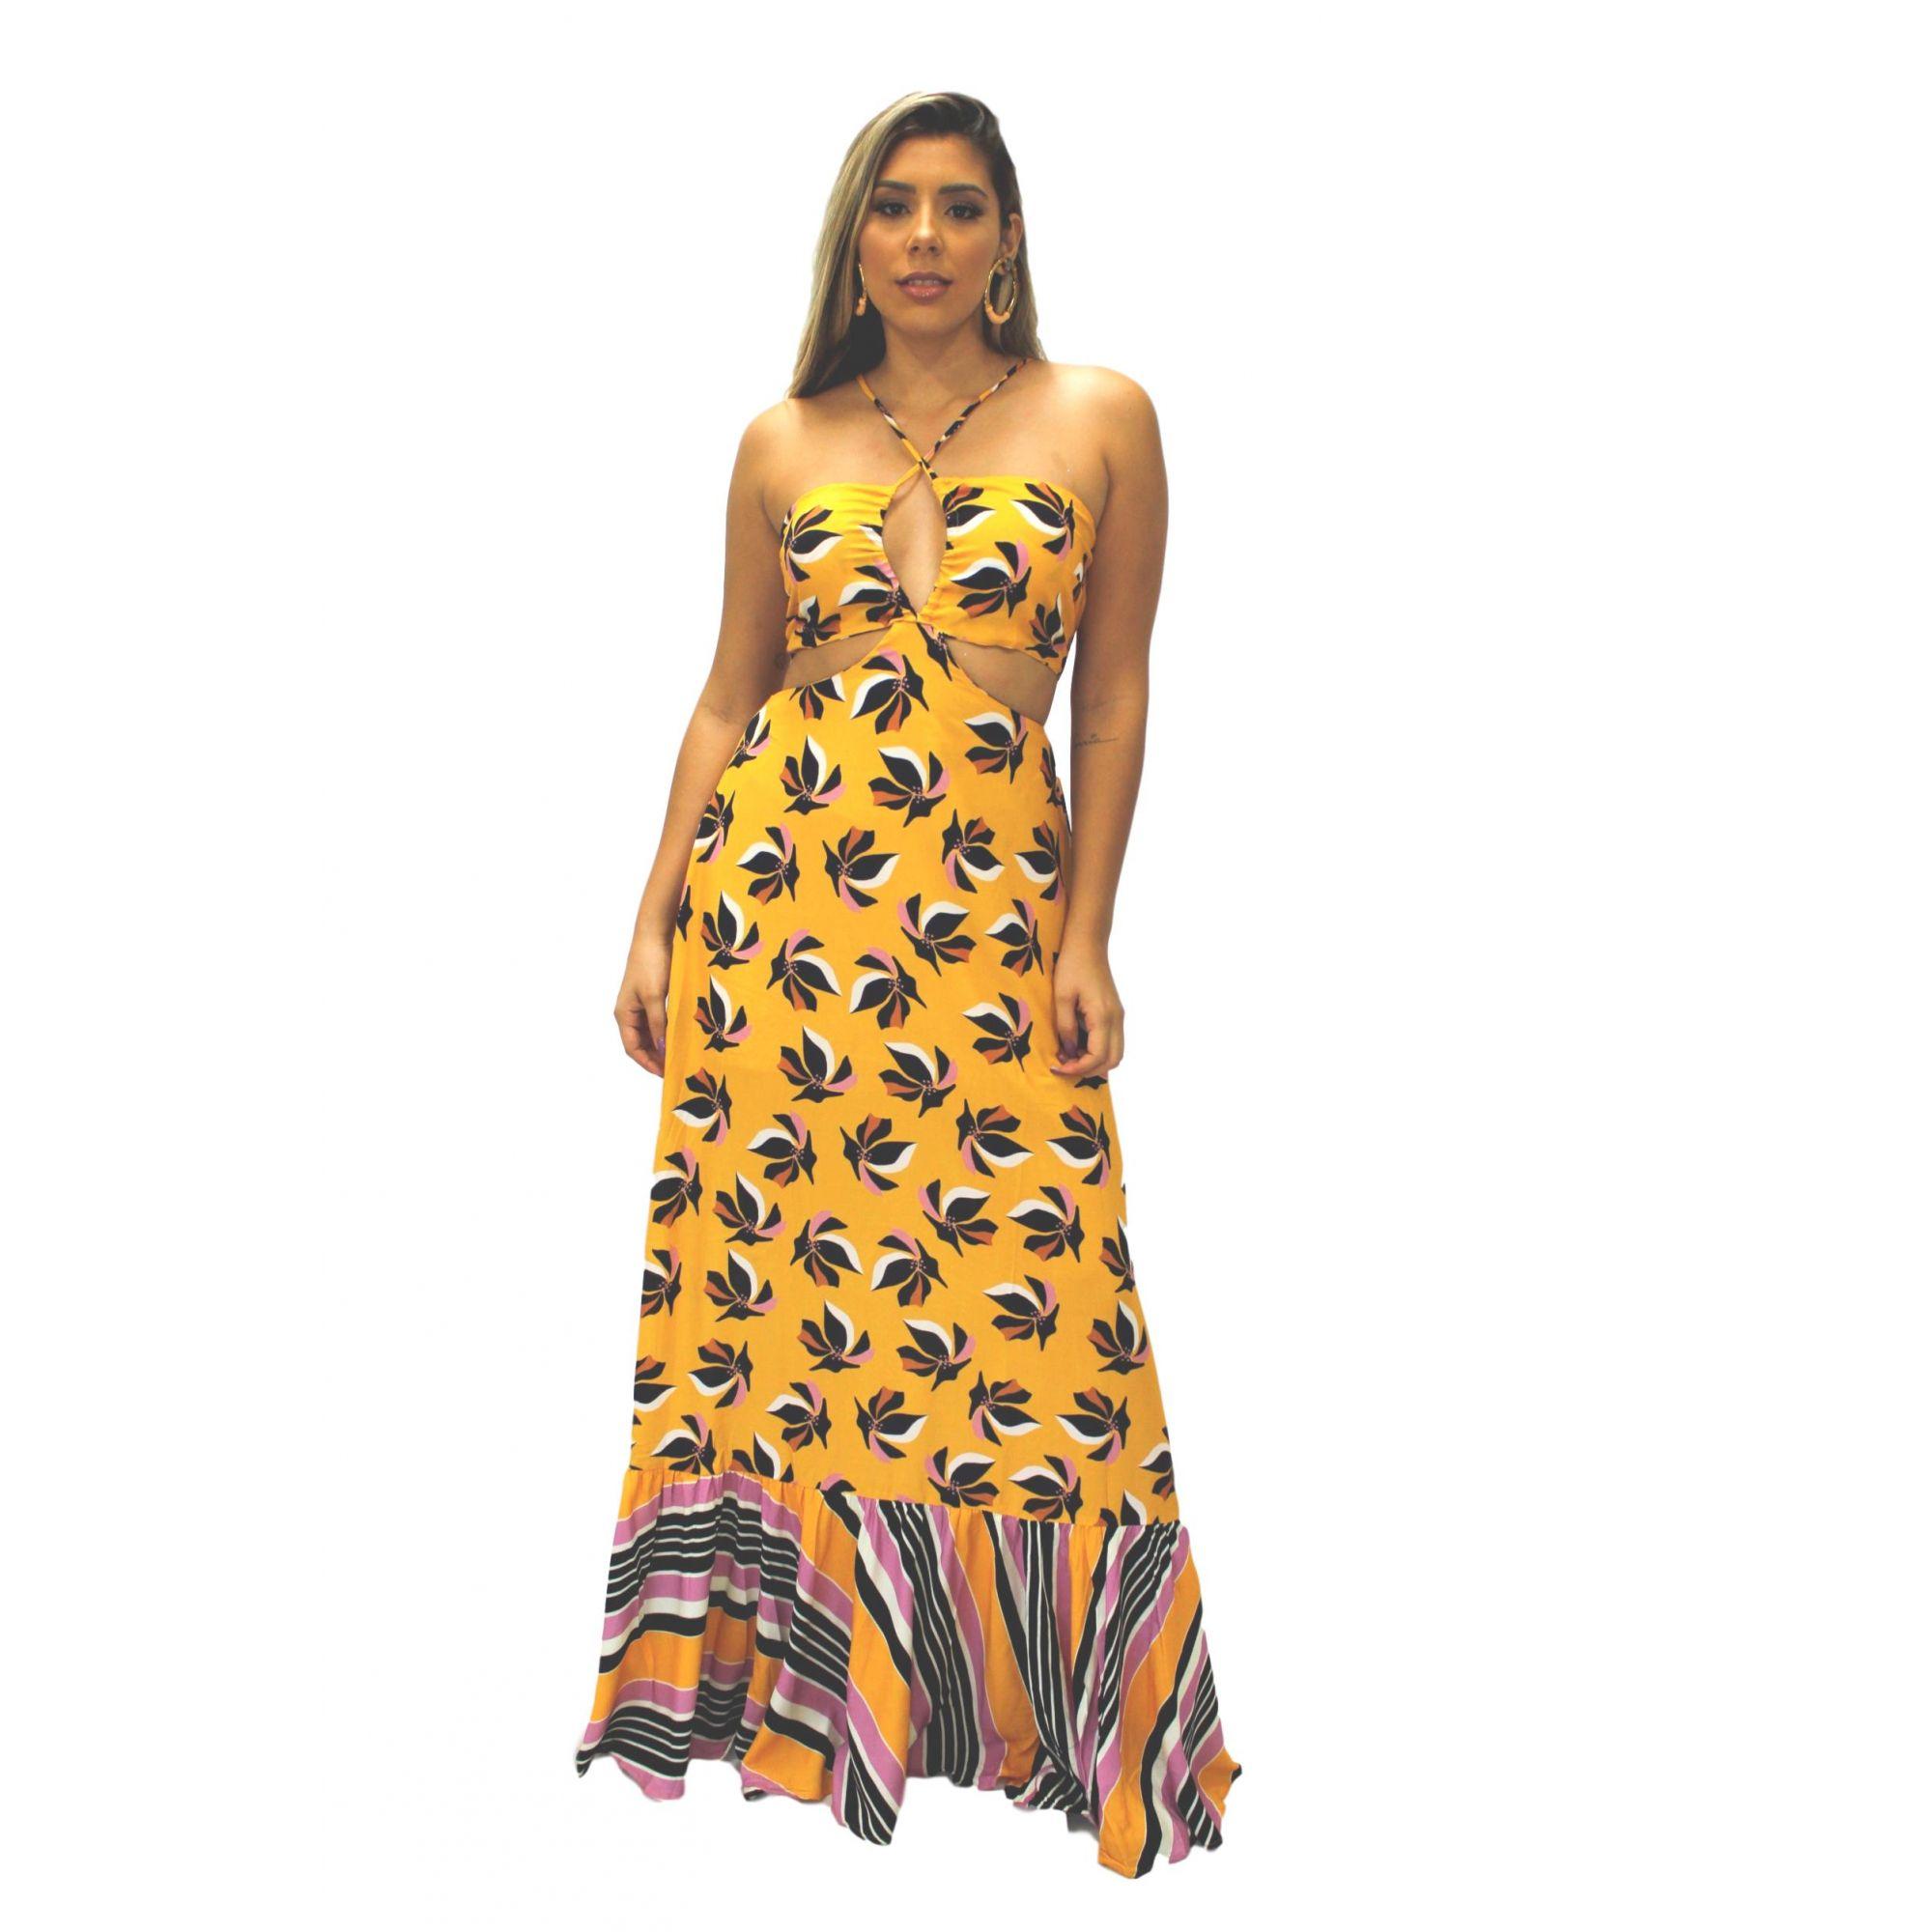 Vestido Longo Mix Estampa Floral e Listras